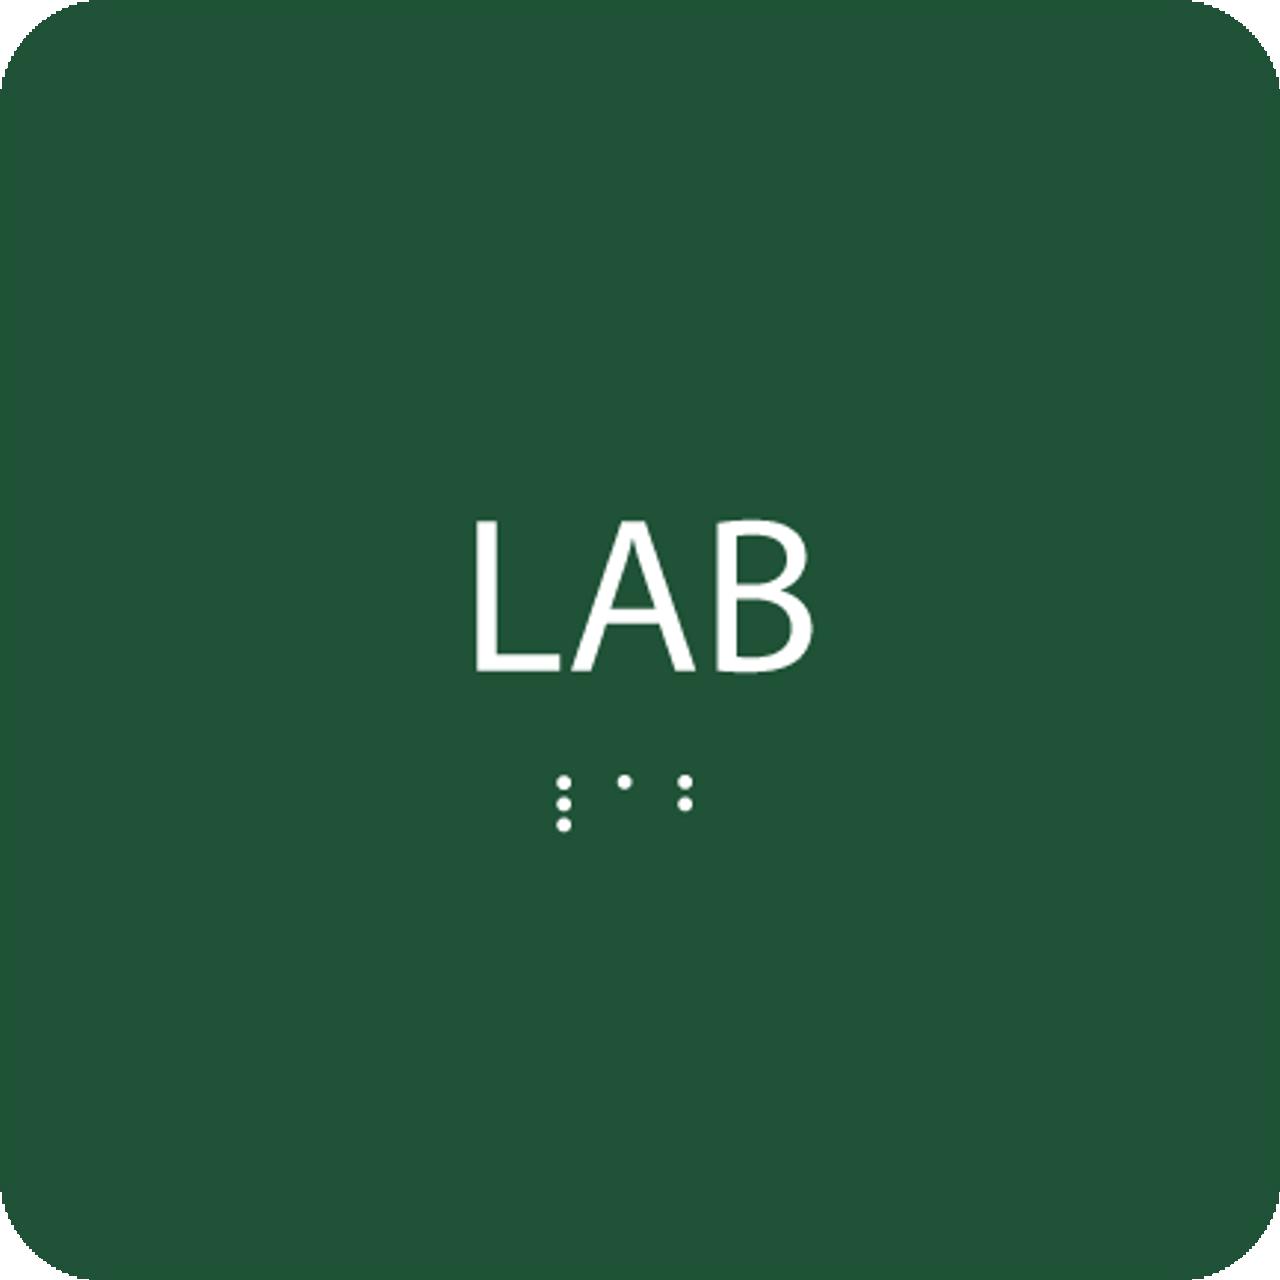 Green Lab Braille Sign